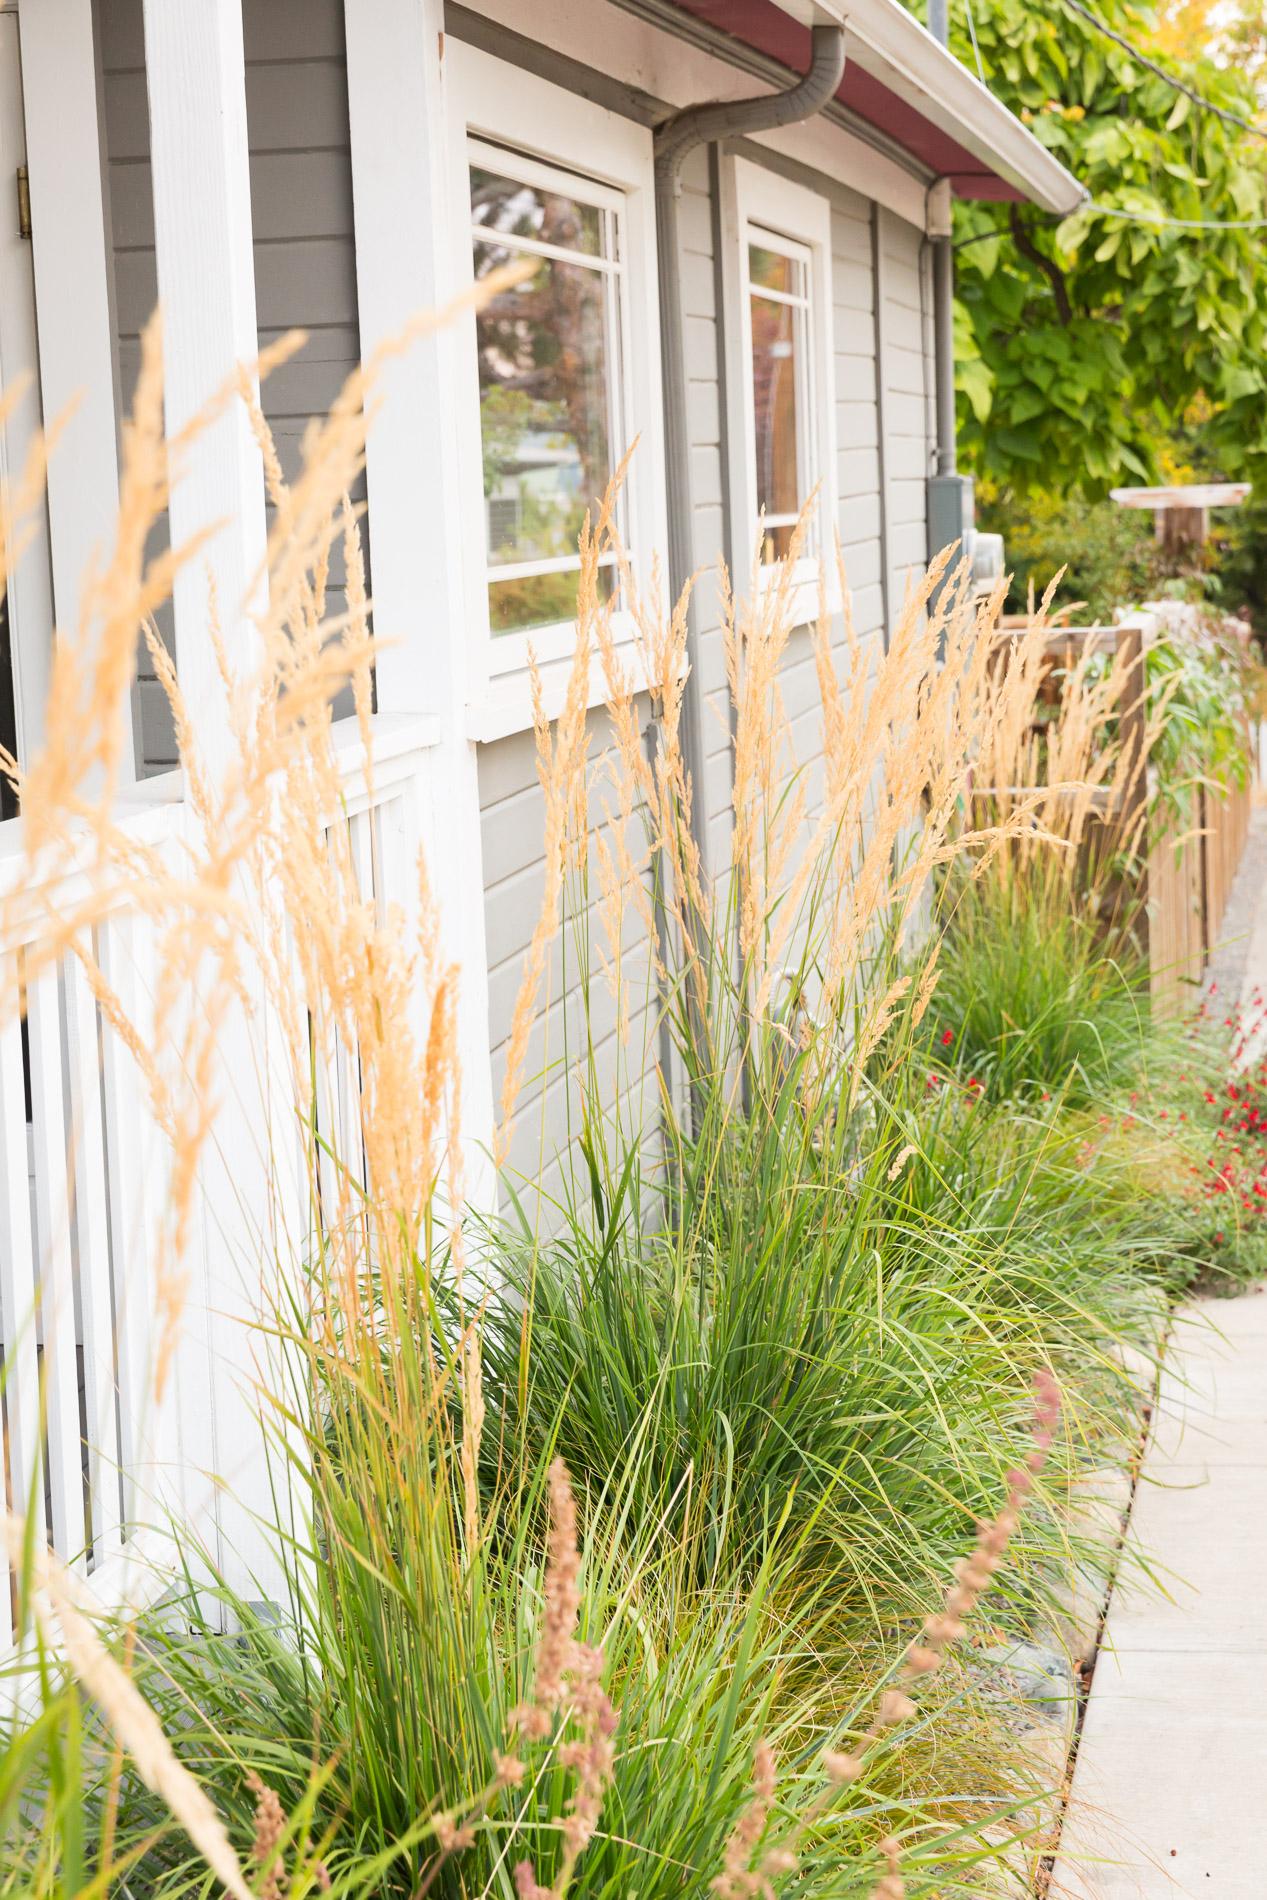 'Karl Foerster' Feather Reed Grass [Calamagrostis x acutiflora]